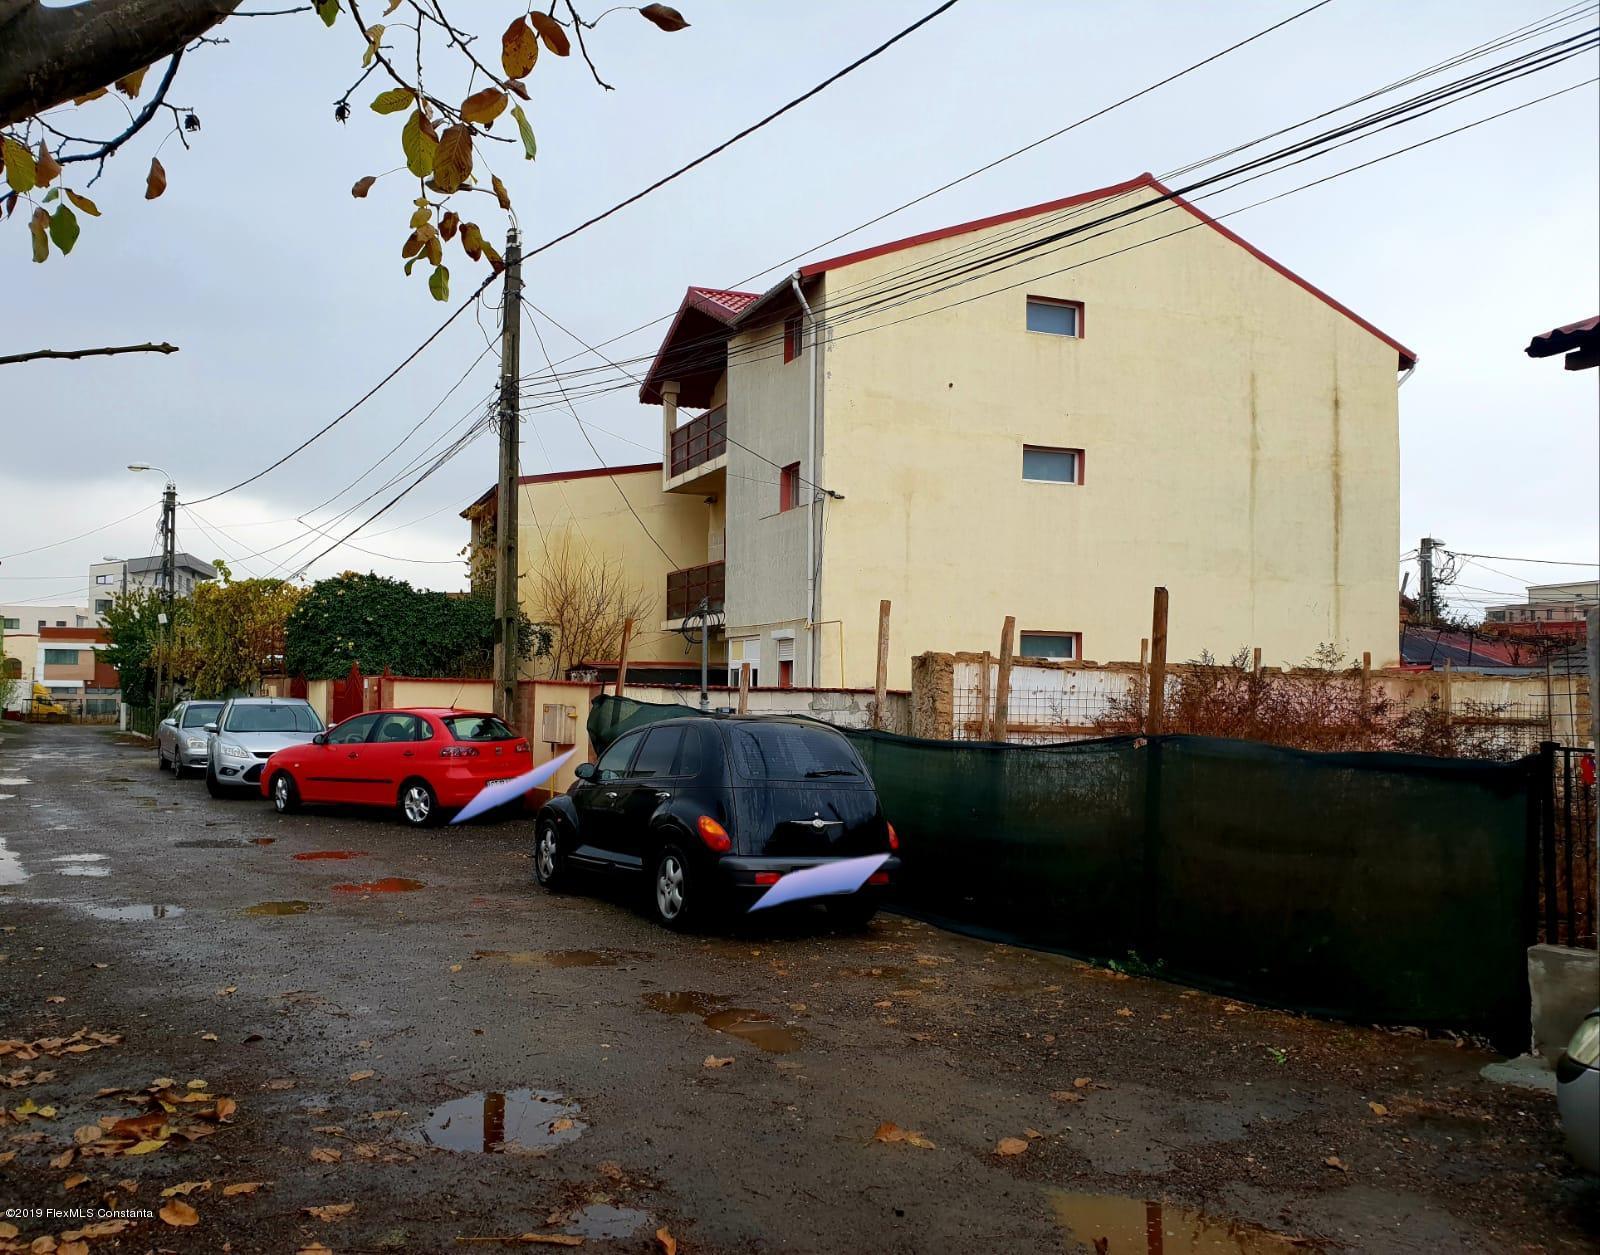 Vanzare Teren Intravilan 220 m² - Compozitorilor, Constanta